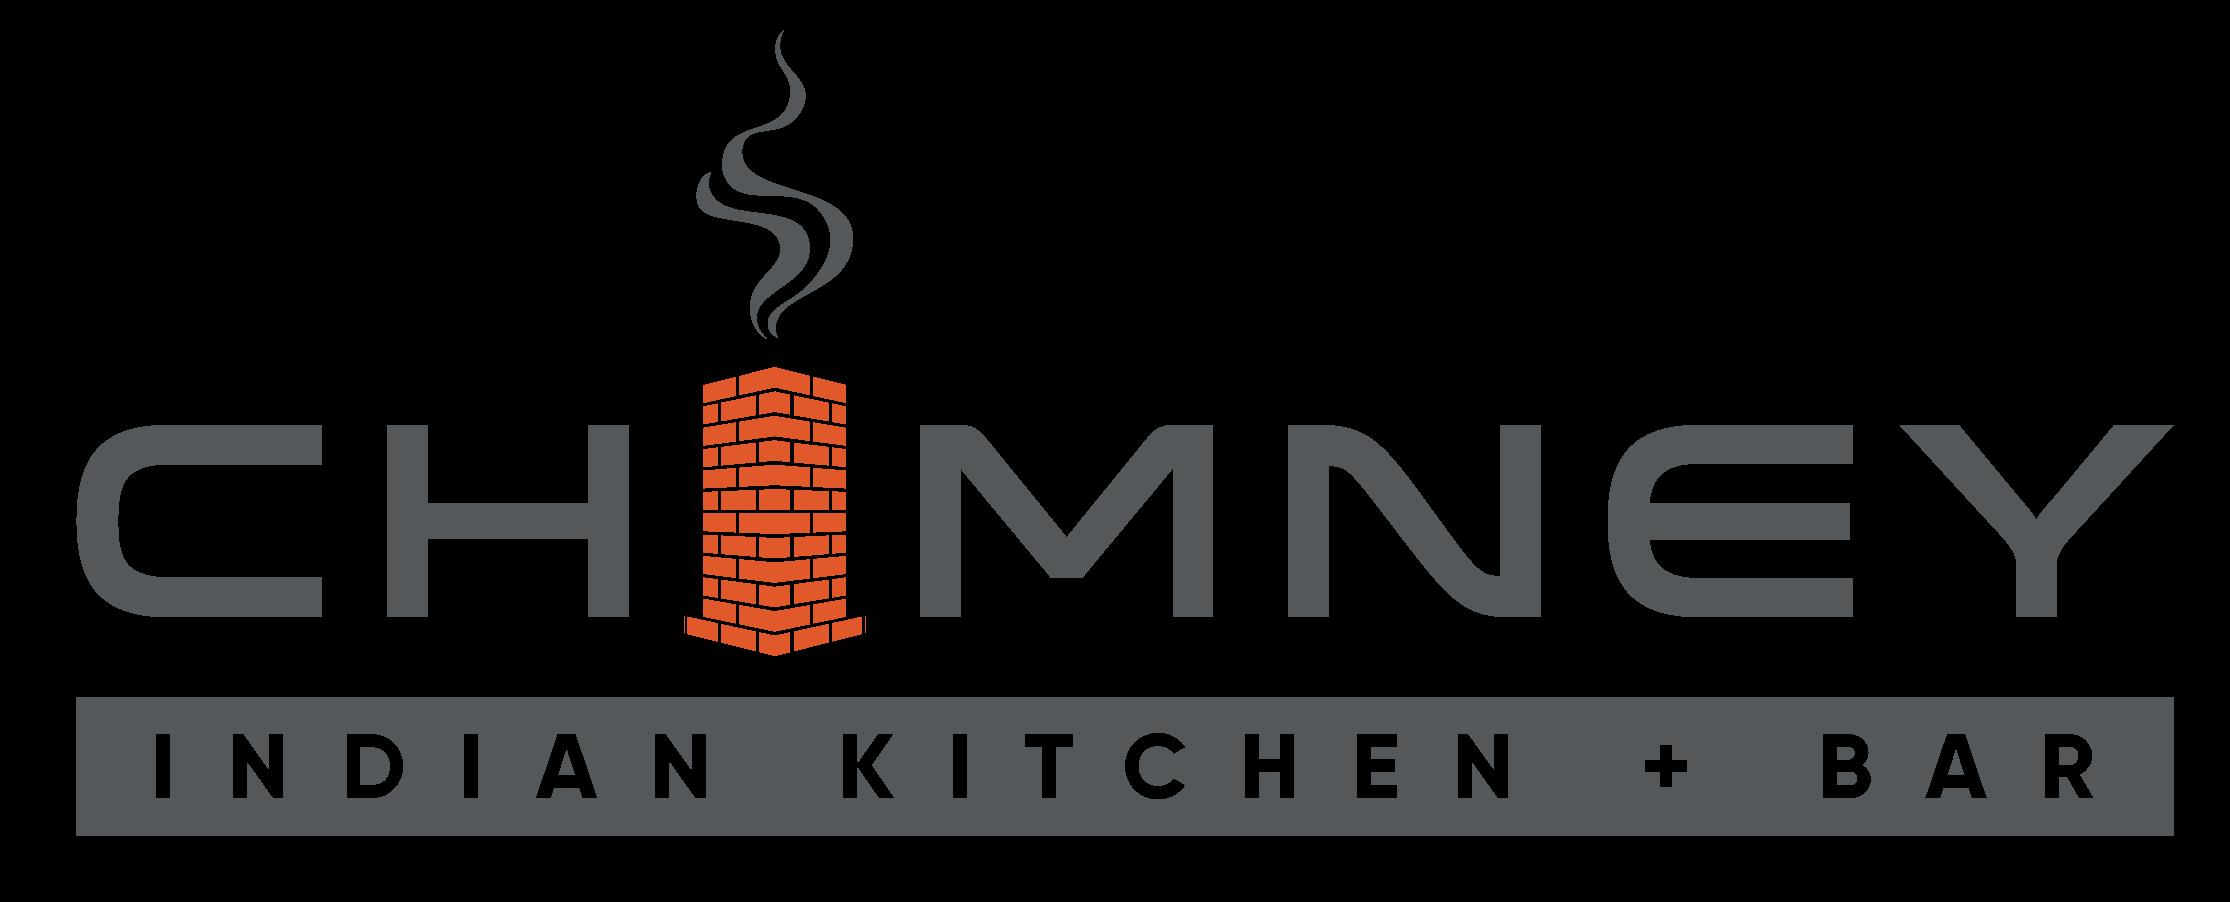 Chimney Indian Kitchen